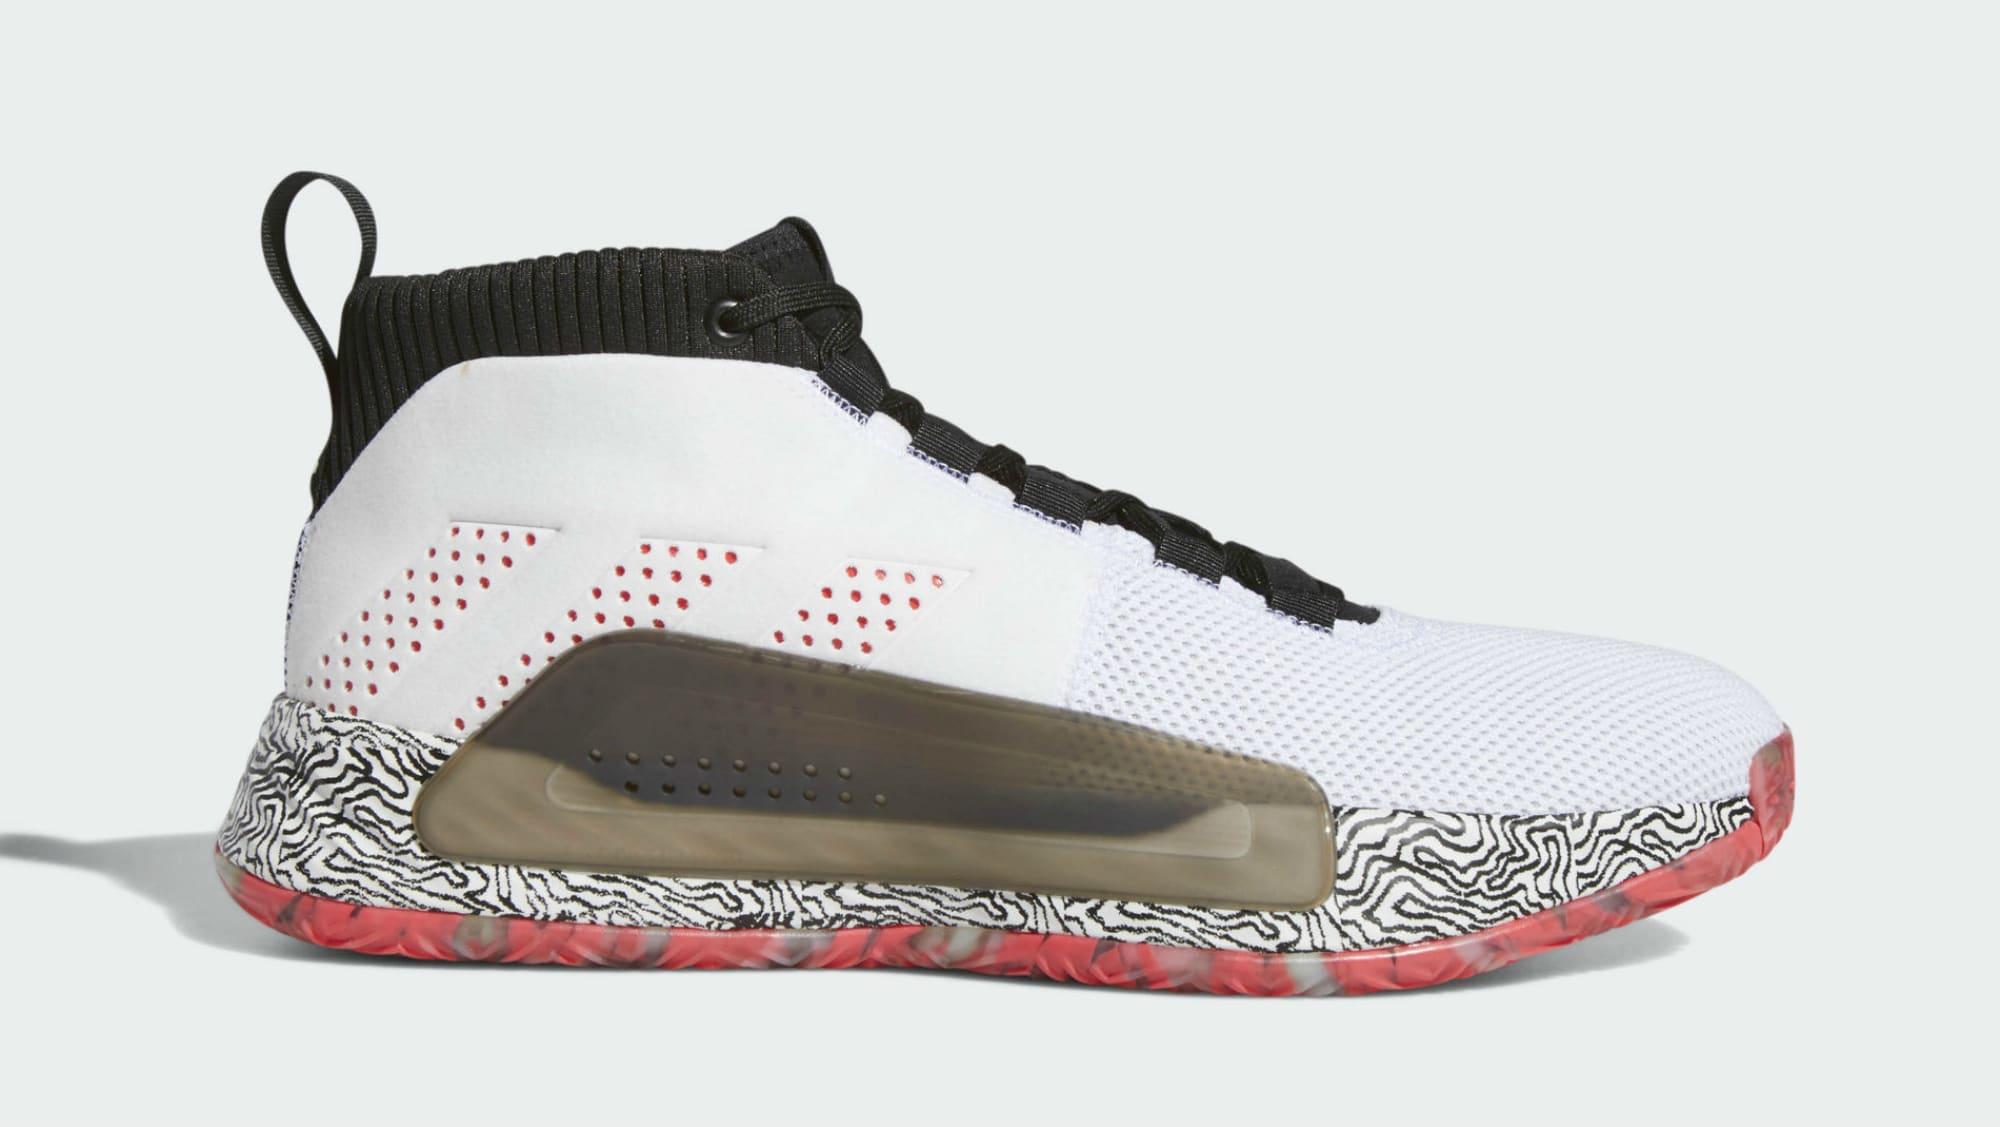 adidas-dame-5-ykwtii-f36561-release-date